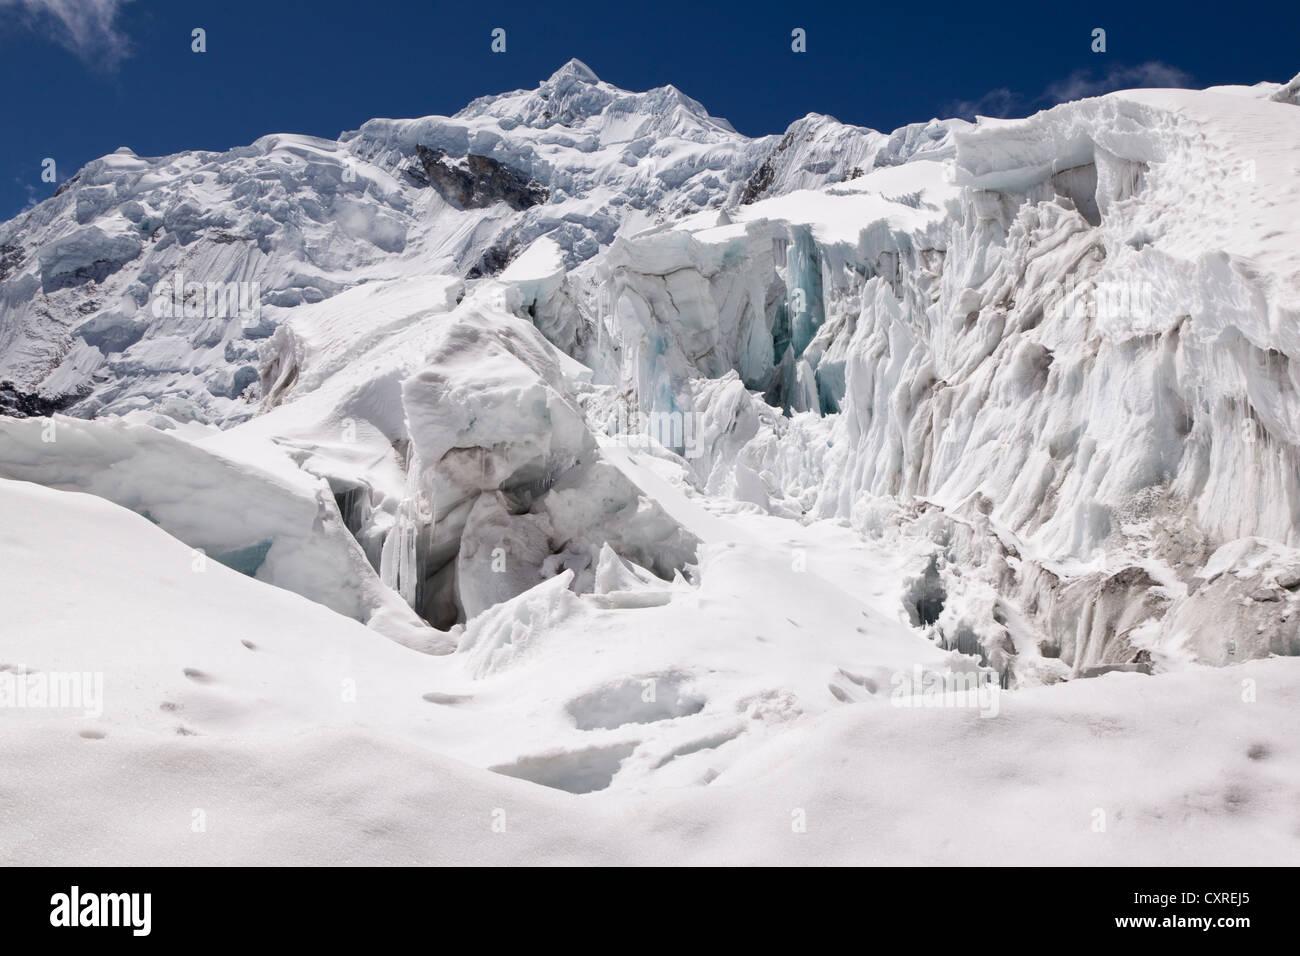 Eisfall vor dem Gipfel des Nevado Chopicalqui Berg, Cordillera Blanca Bergkette, Anden, Peru, Südamerika Stockbild